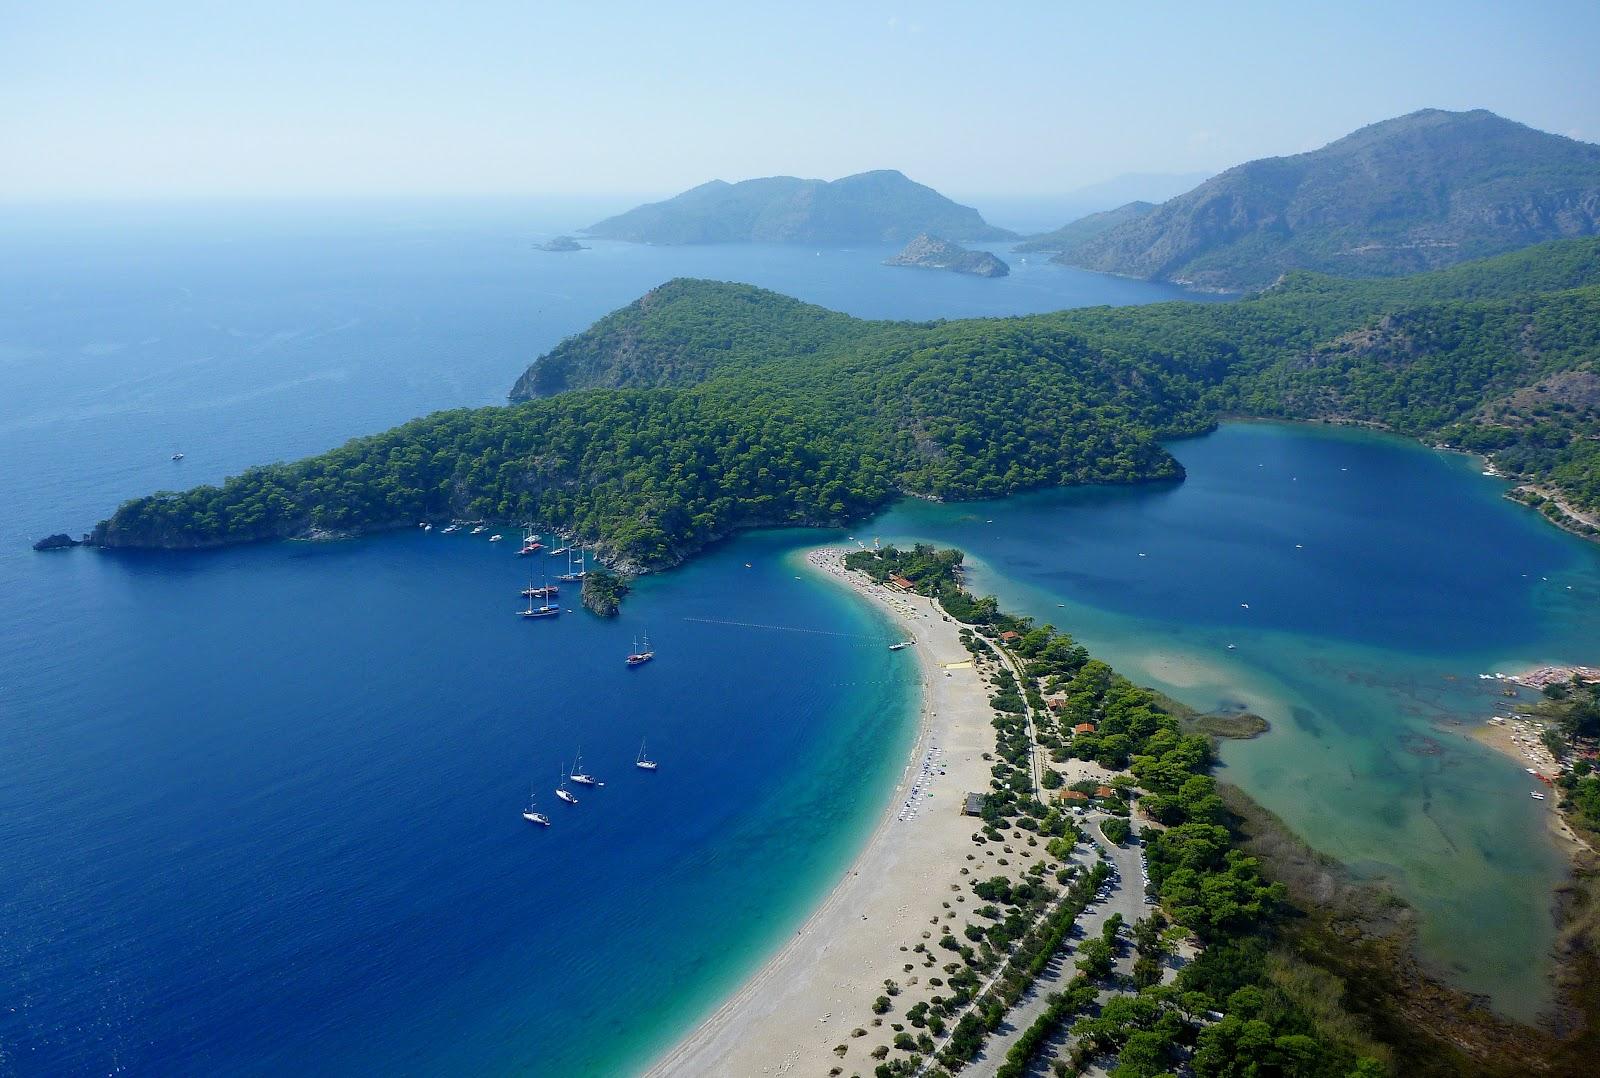 oludeniz blue lagoon aerial view turkey turquoise sea sandy beach turkish riviera